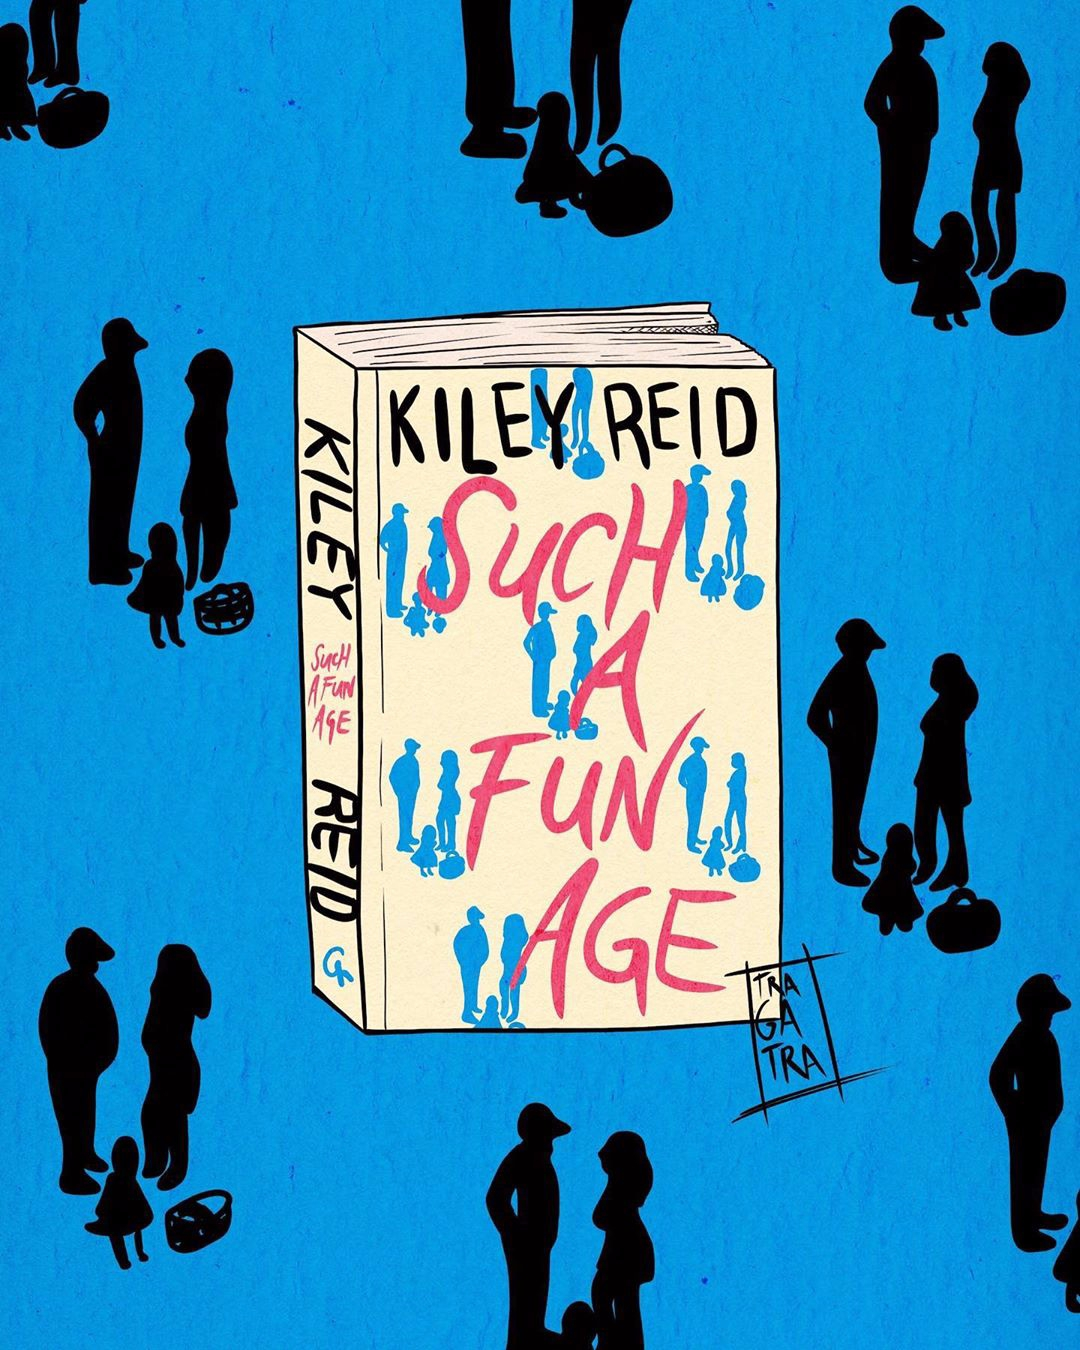 Fun Age Kiley Reid black Emira  - tragatra | ello